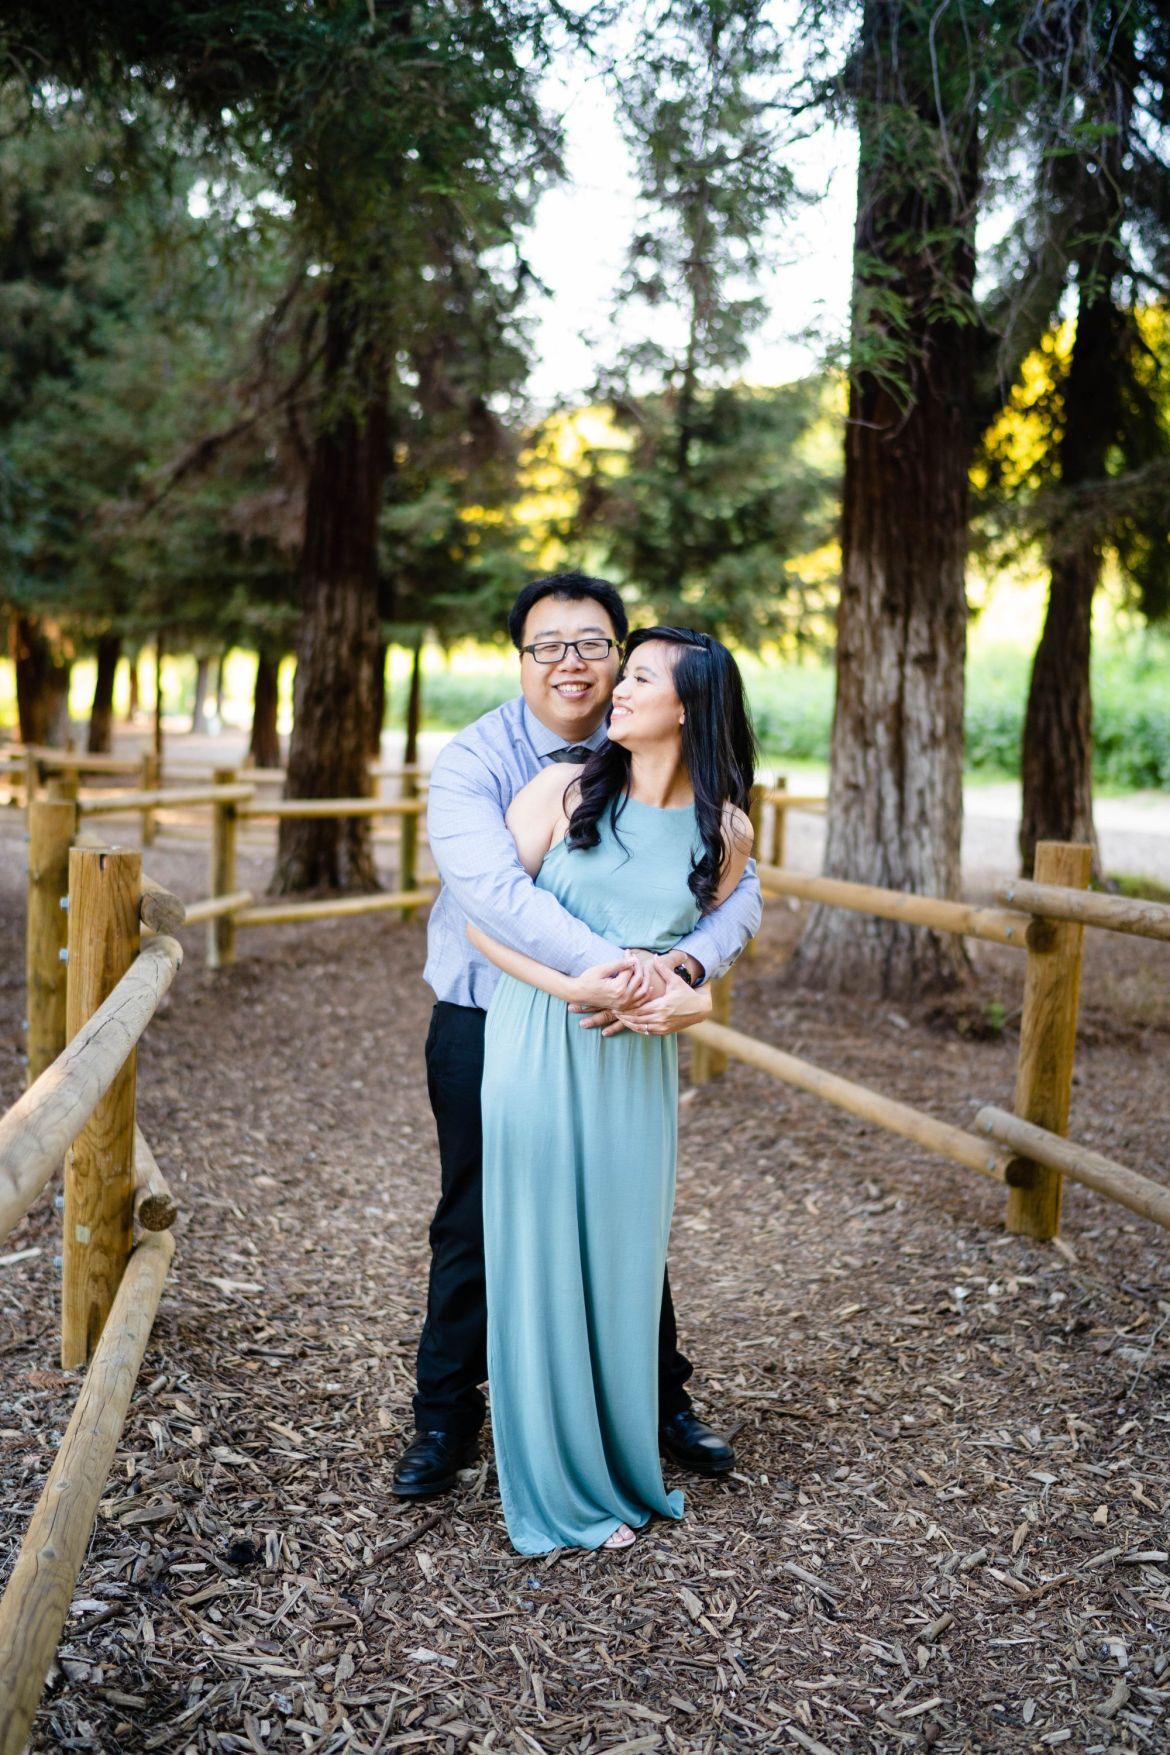 Rowland Heights Wedding Photographer 16